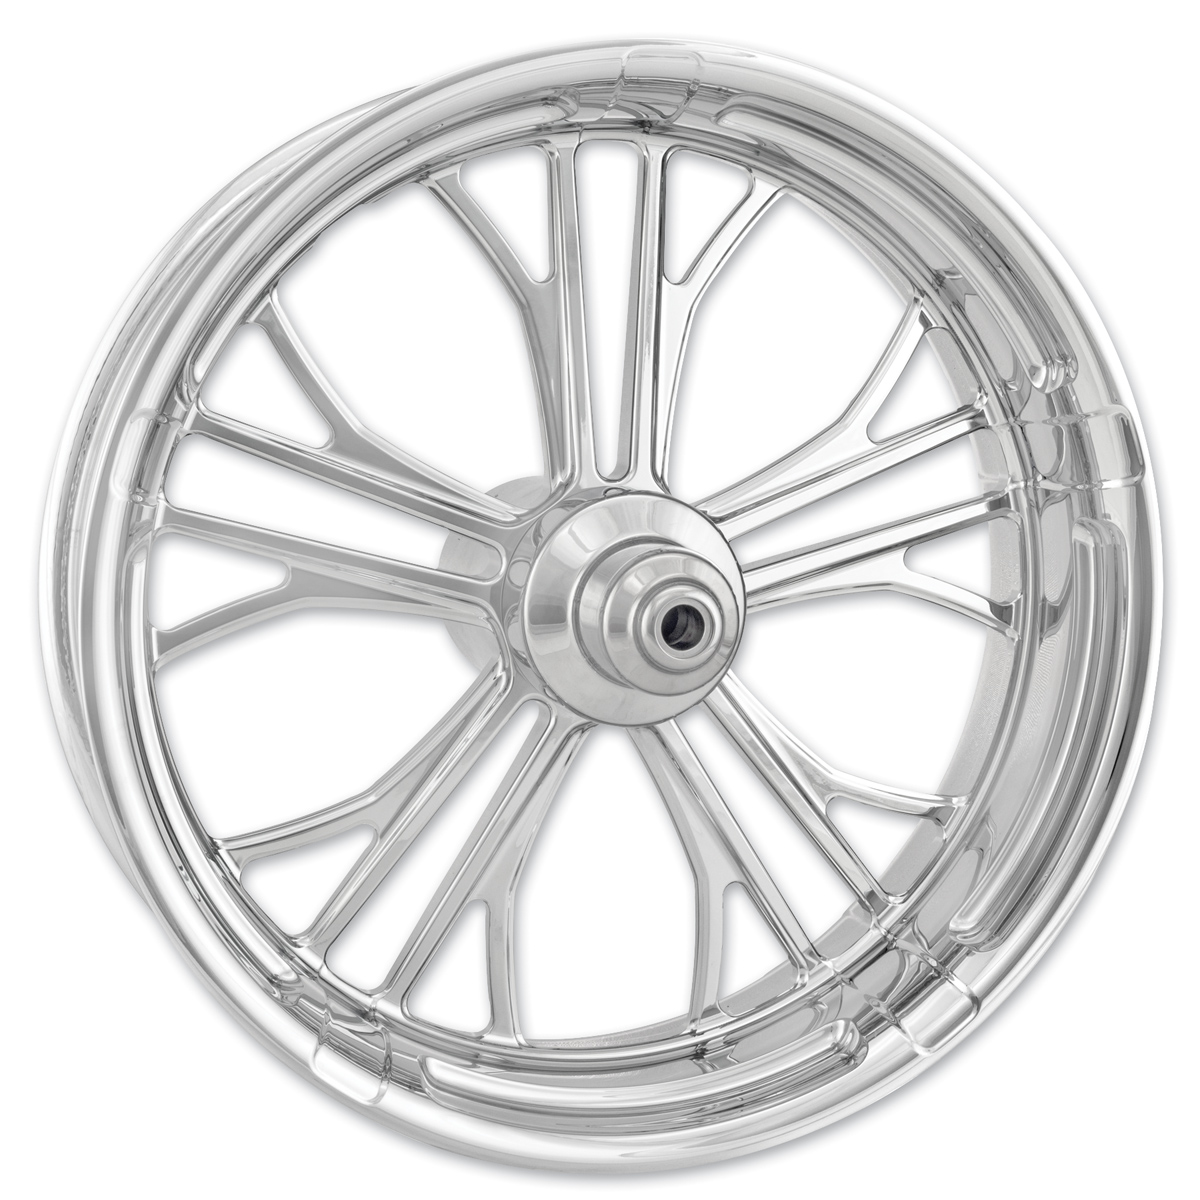 Performance Machine Dixon Chrome Front Wheel 18x3.5 Dual disc